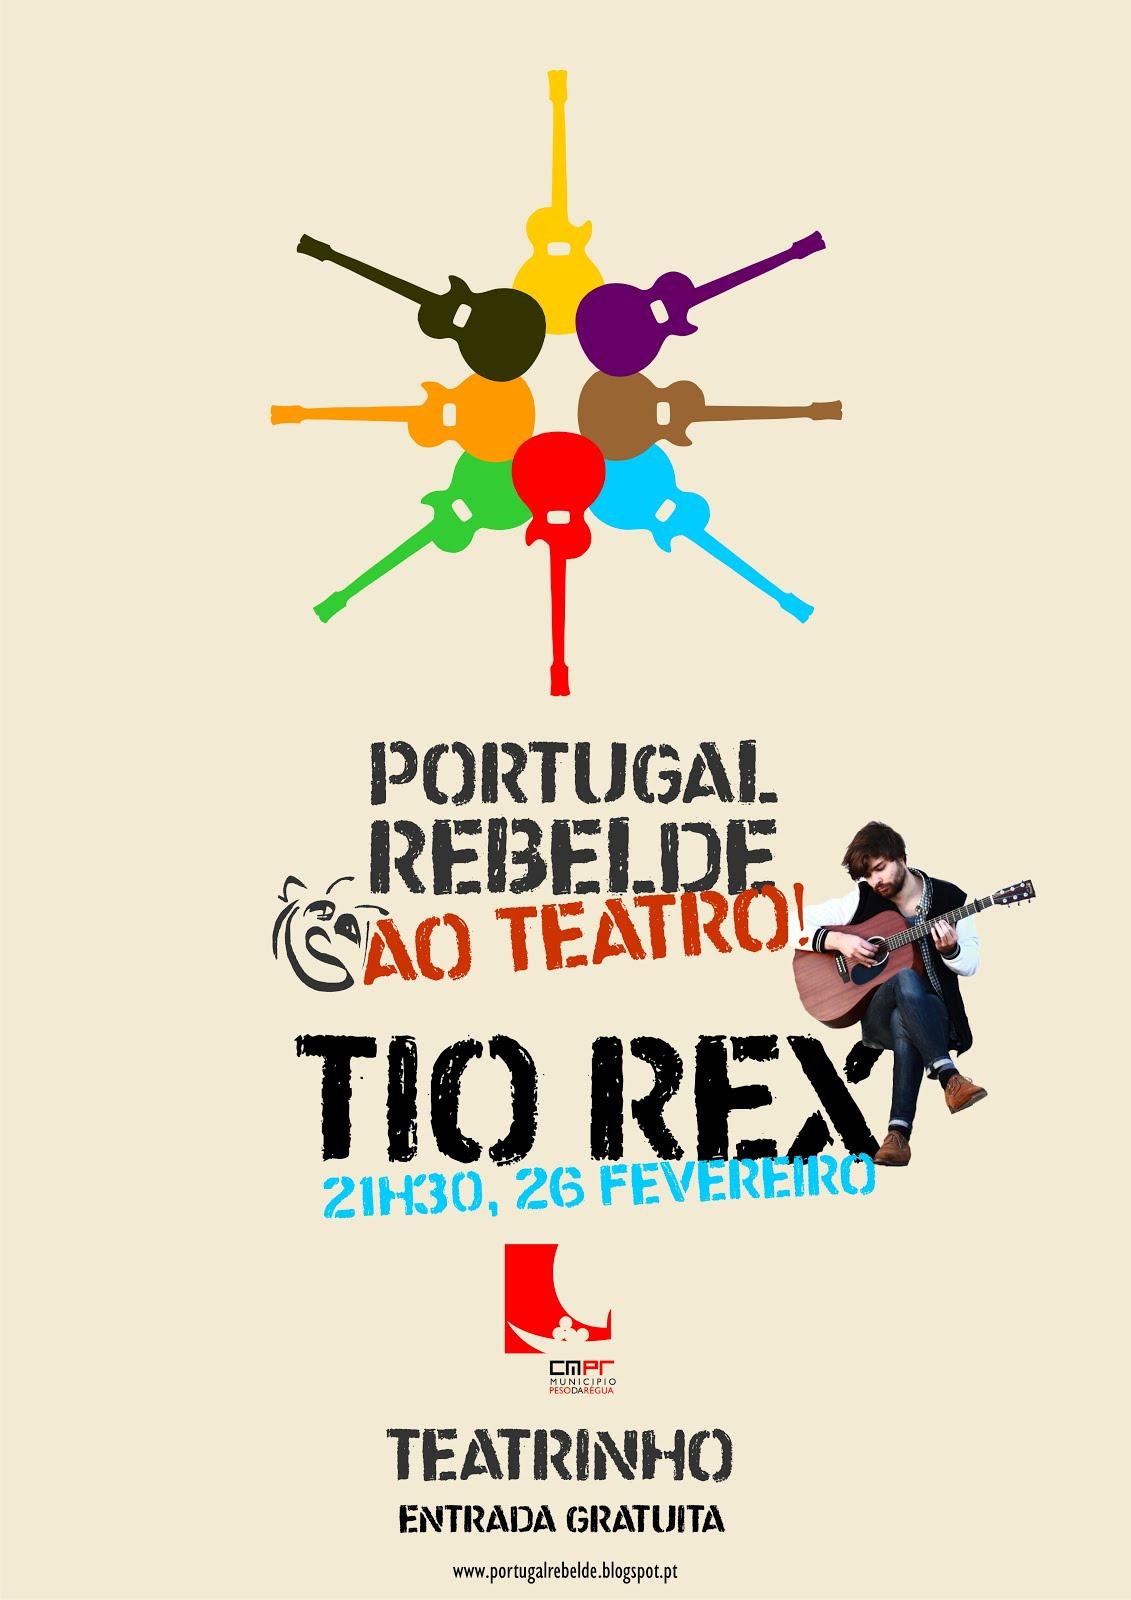 Portugal Rebelde ao Teatro!